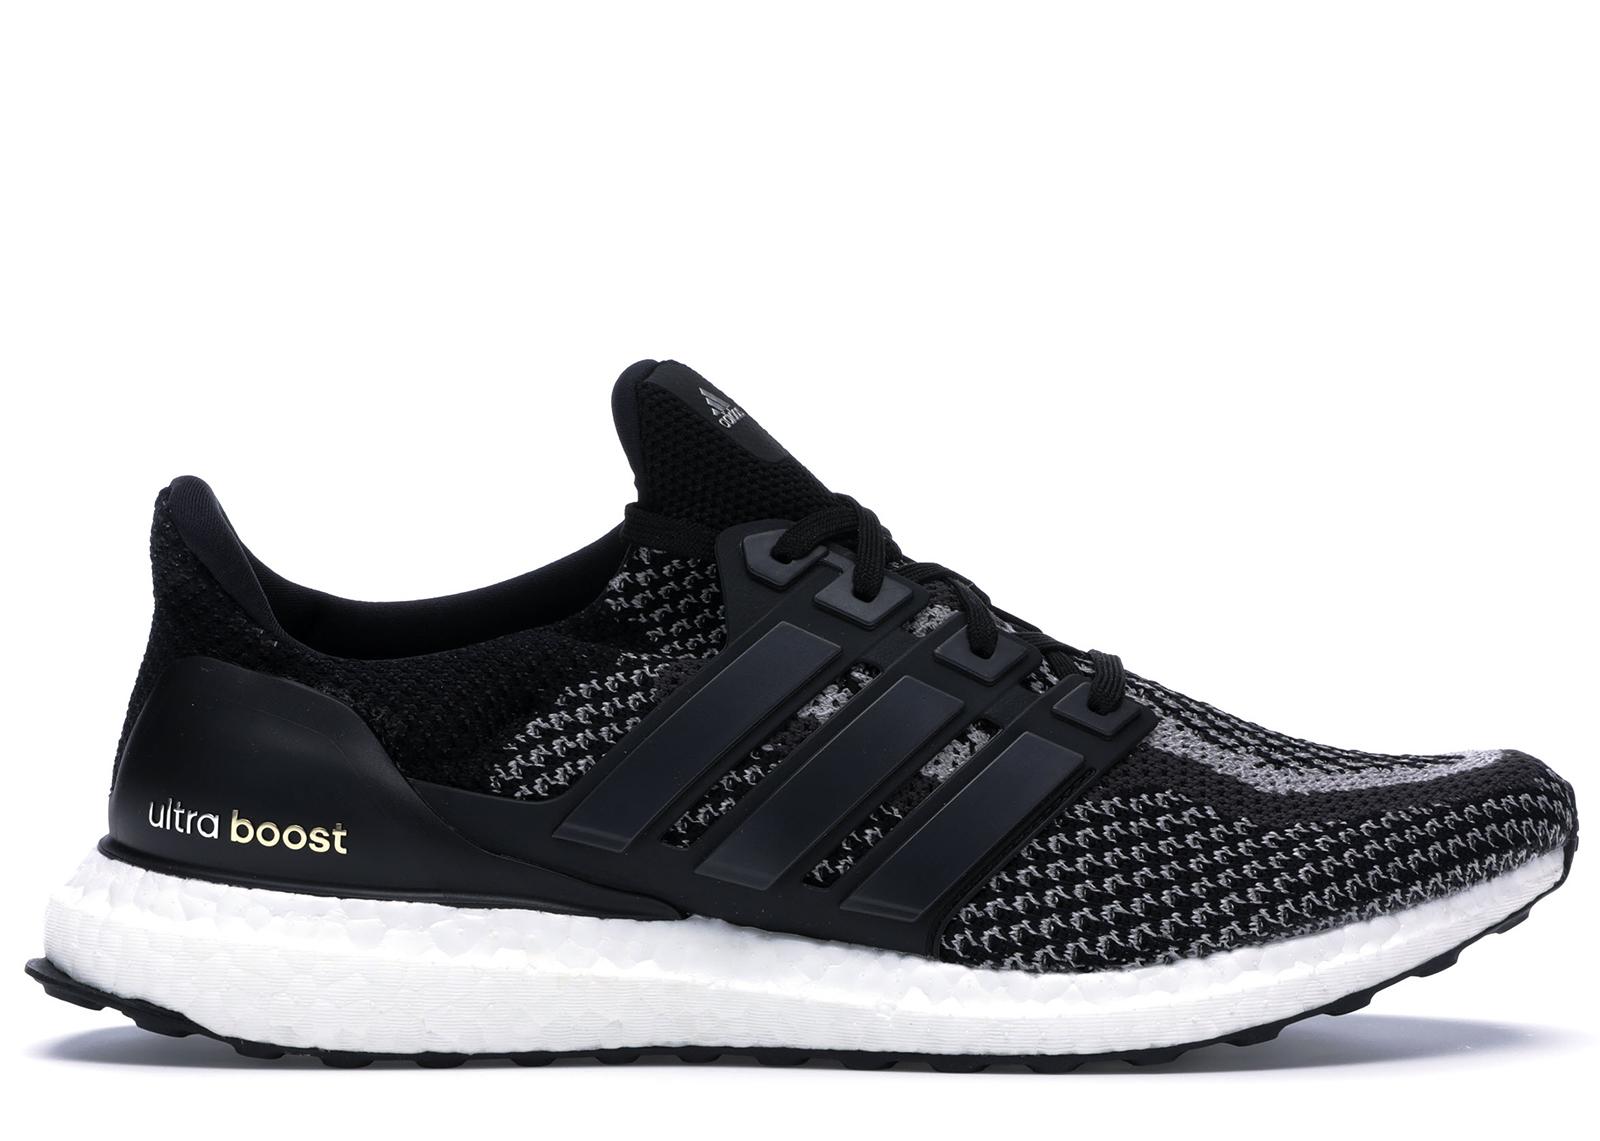 hot adidas ultra boost black reflective 9060e 03bc5